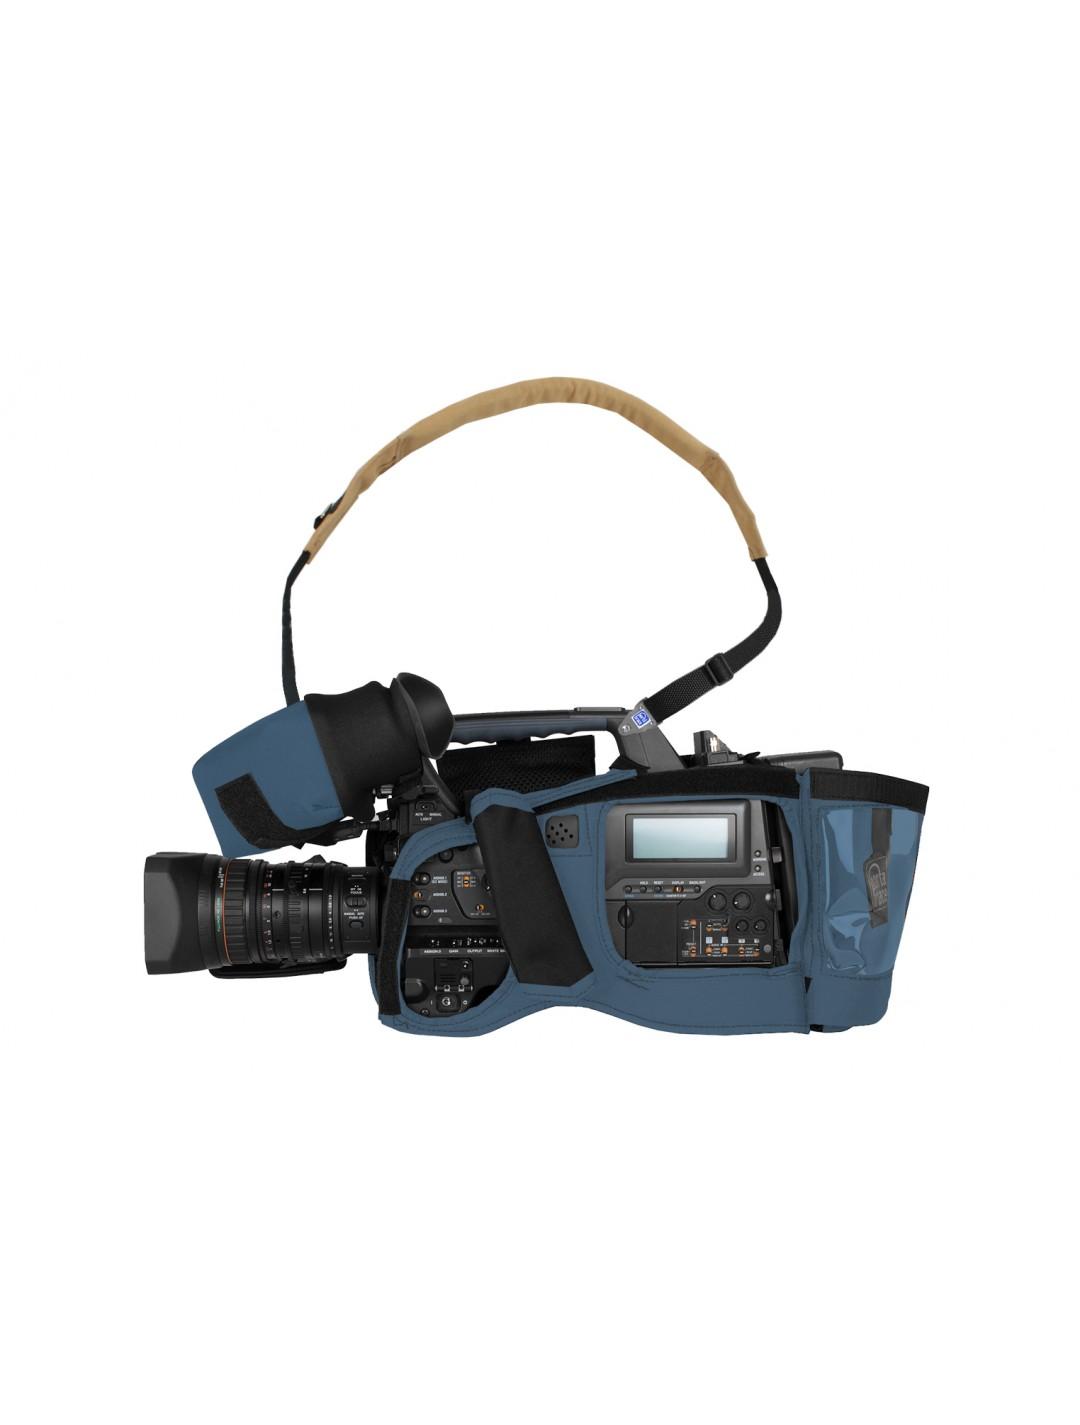 Porta Brace CBA-PXWX320 Capa de protecção para Sony CBA-PXWX320